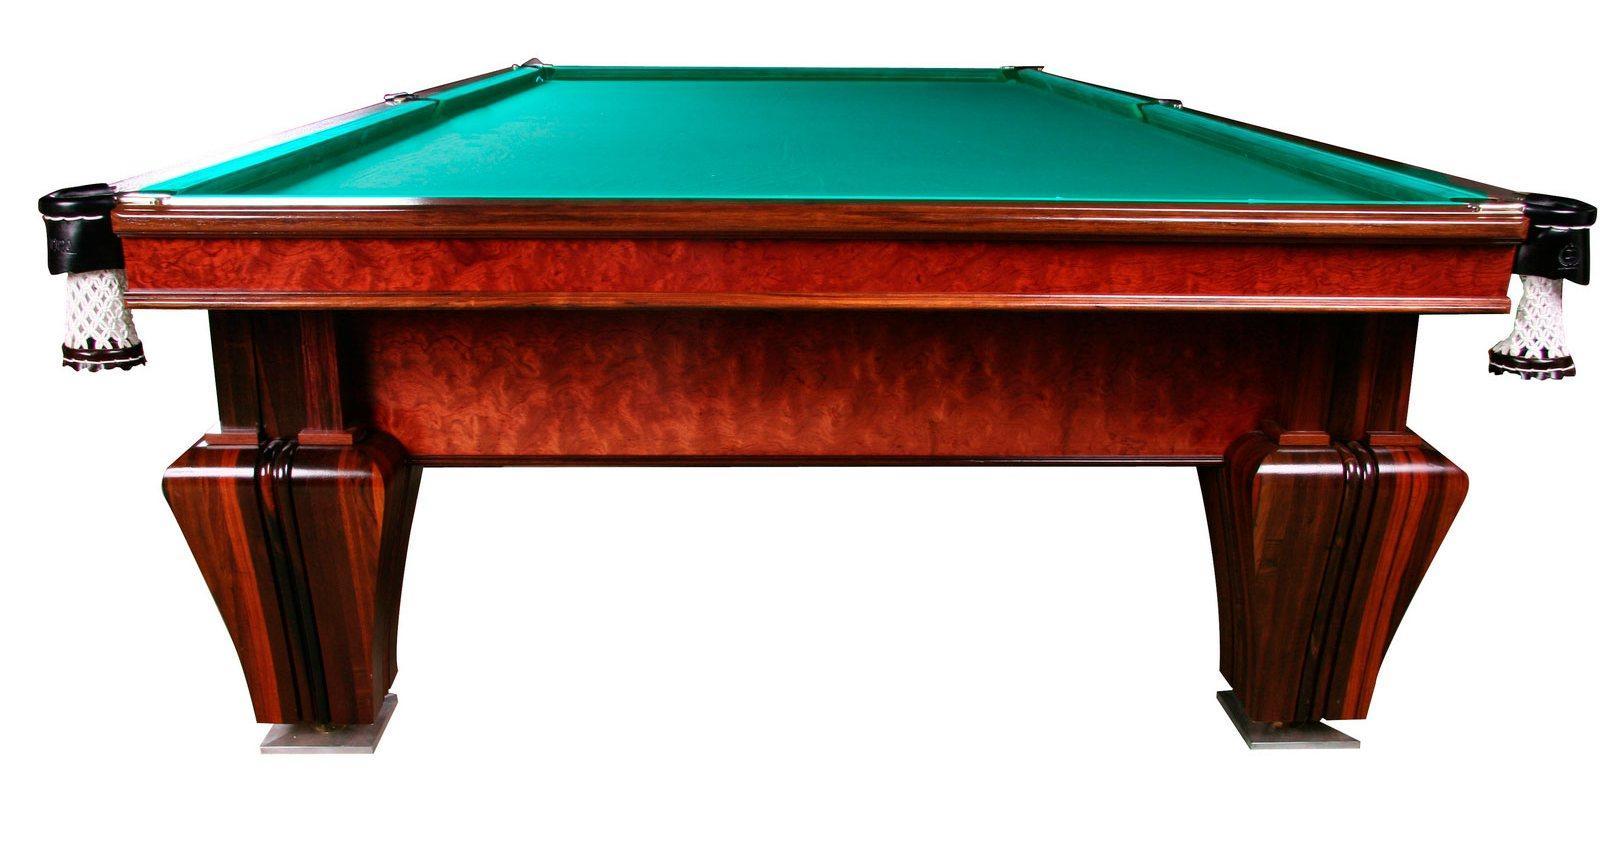 фото стол бильярдный